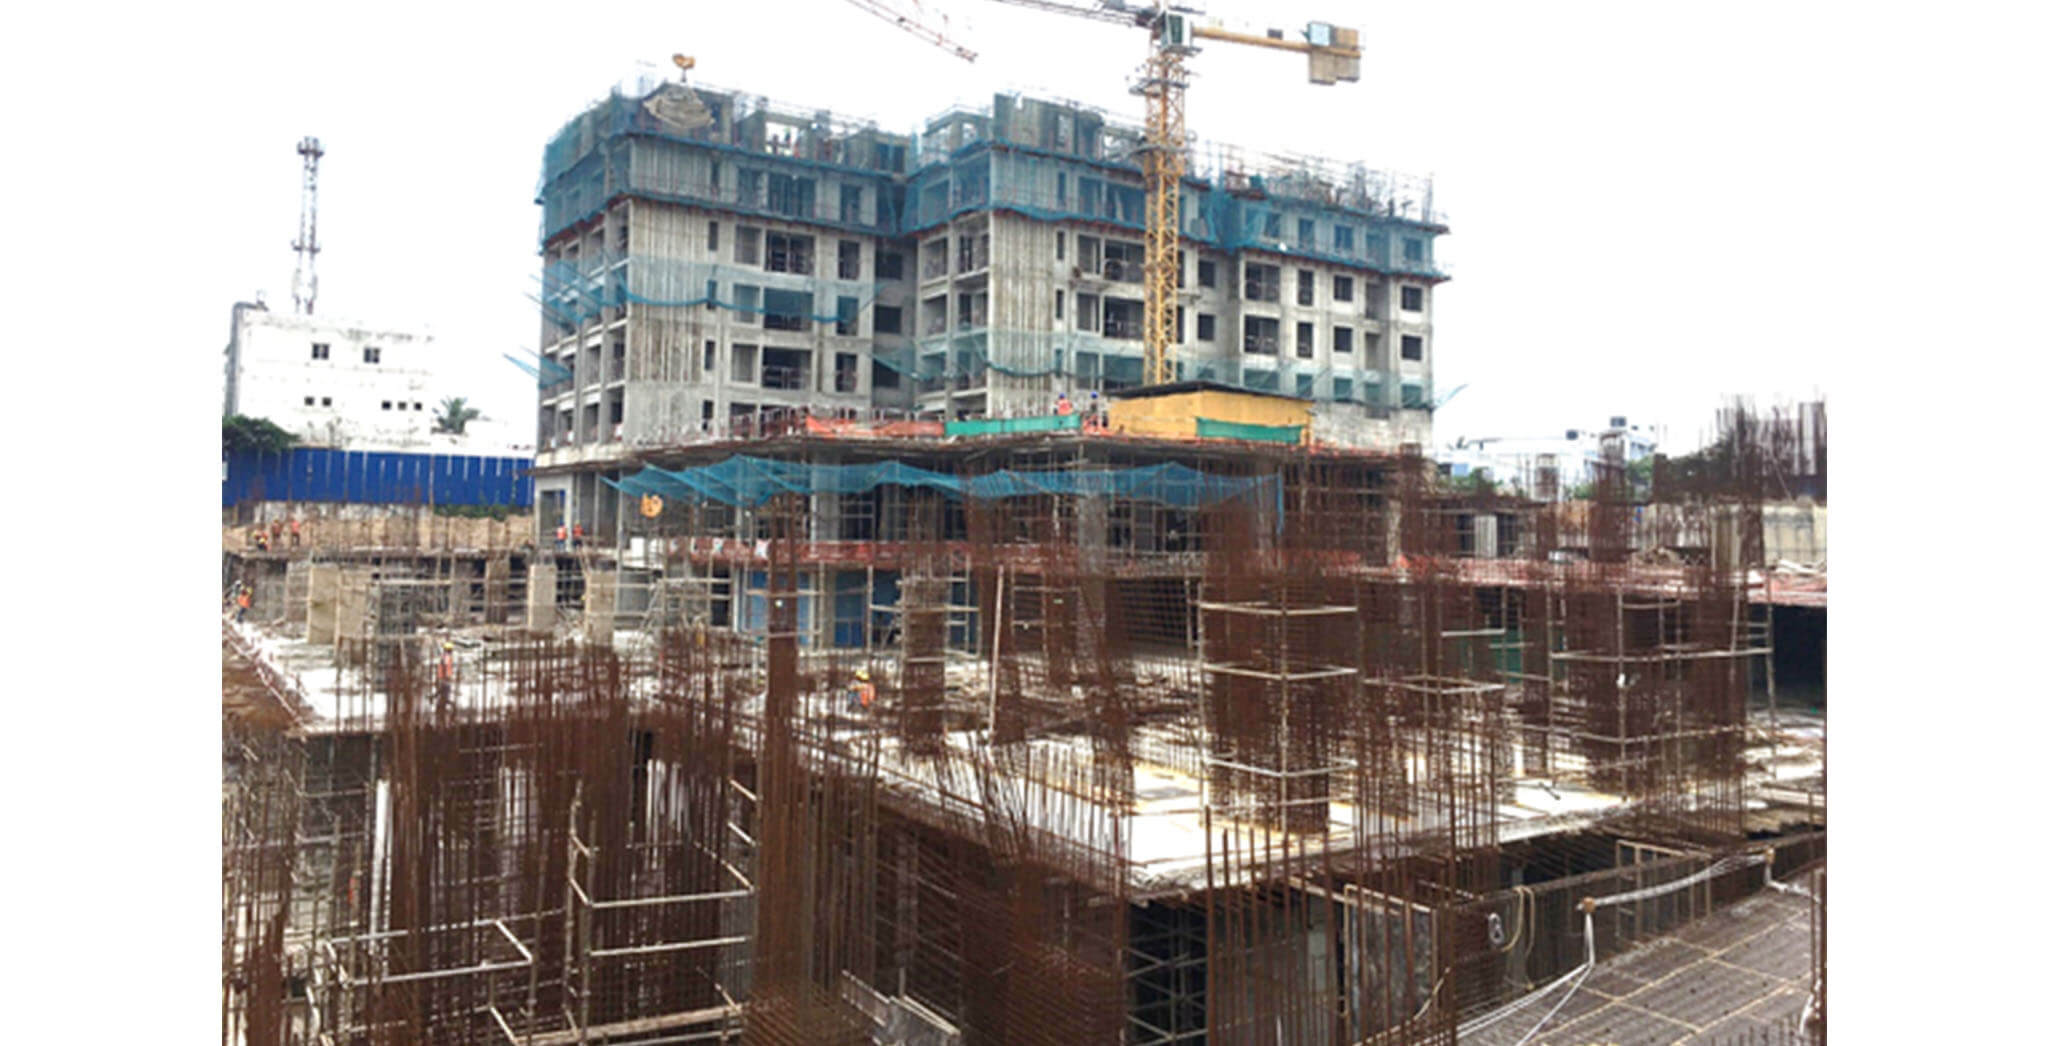 Jun 2021 - Tower A2: Basement 1 and raft work is in progress